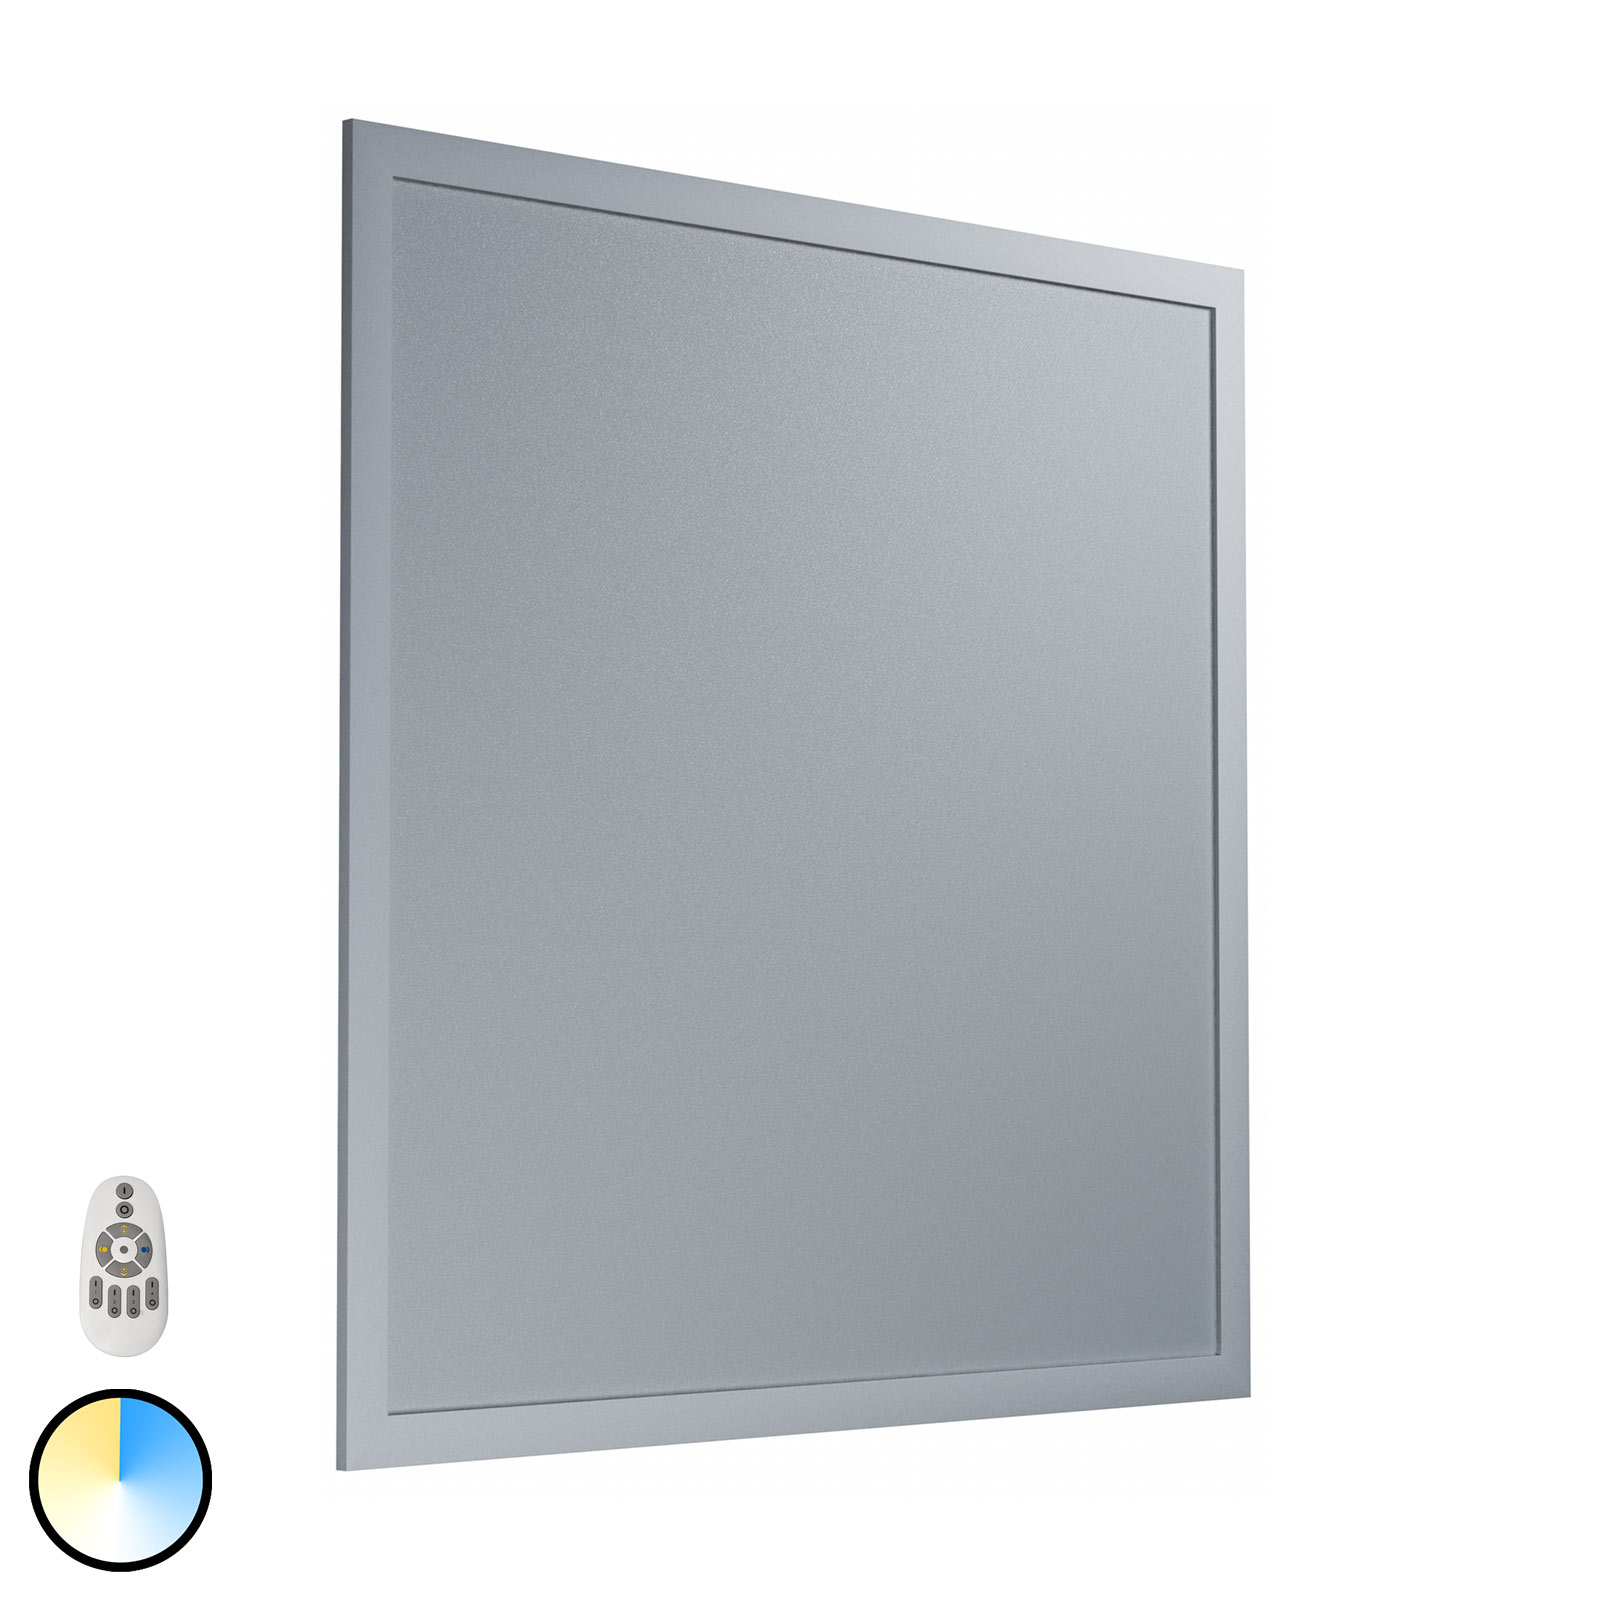 LEDVANCE Planon Plus LED-panel 60 cm 840 30W CCT